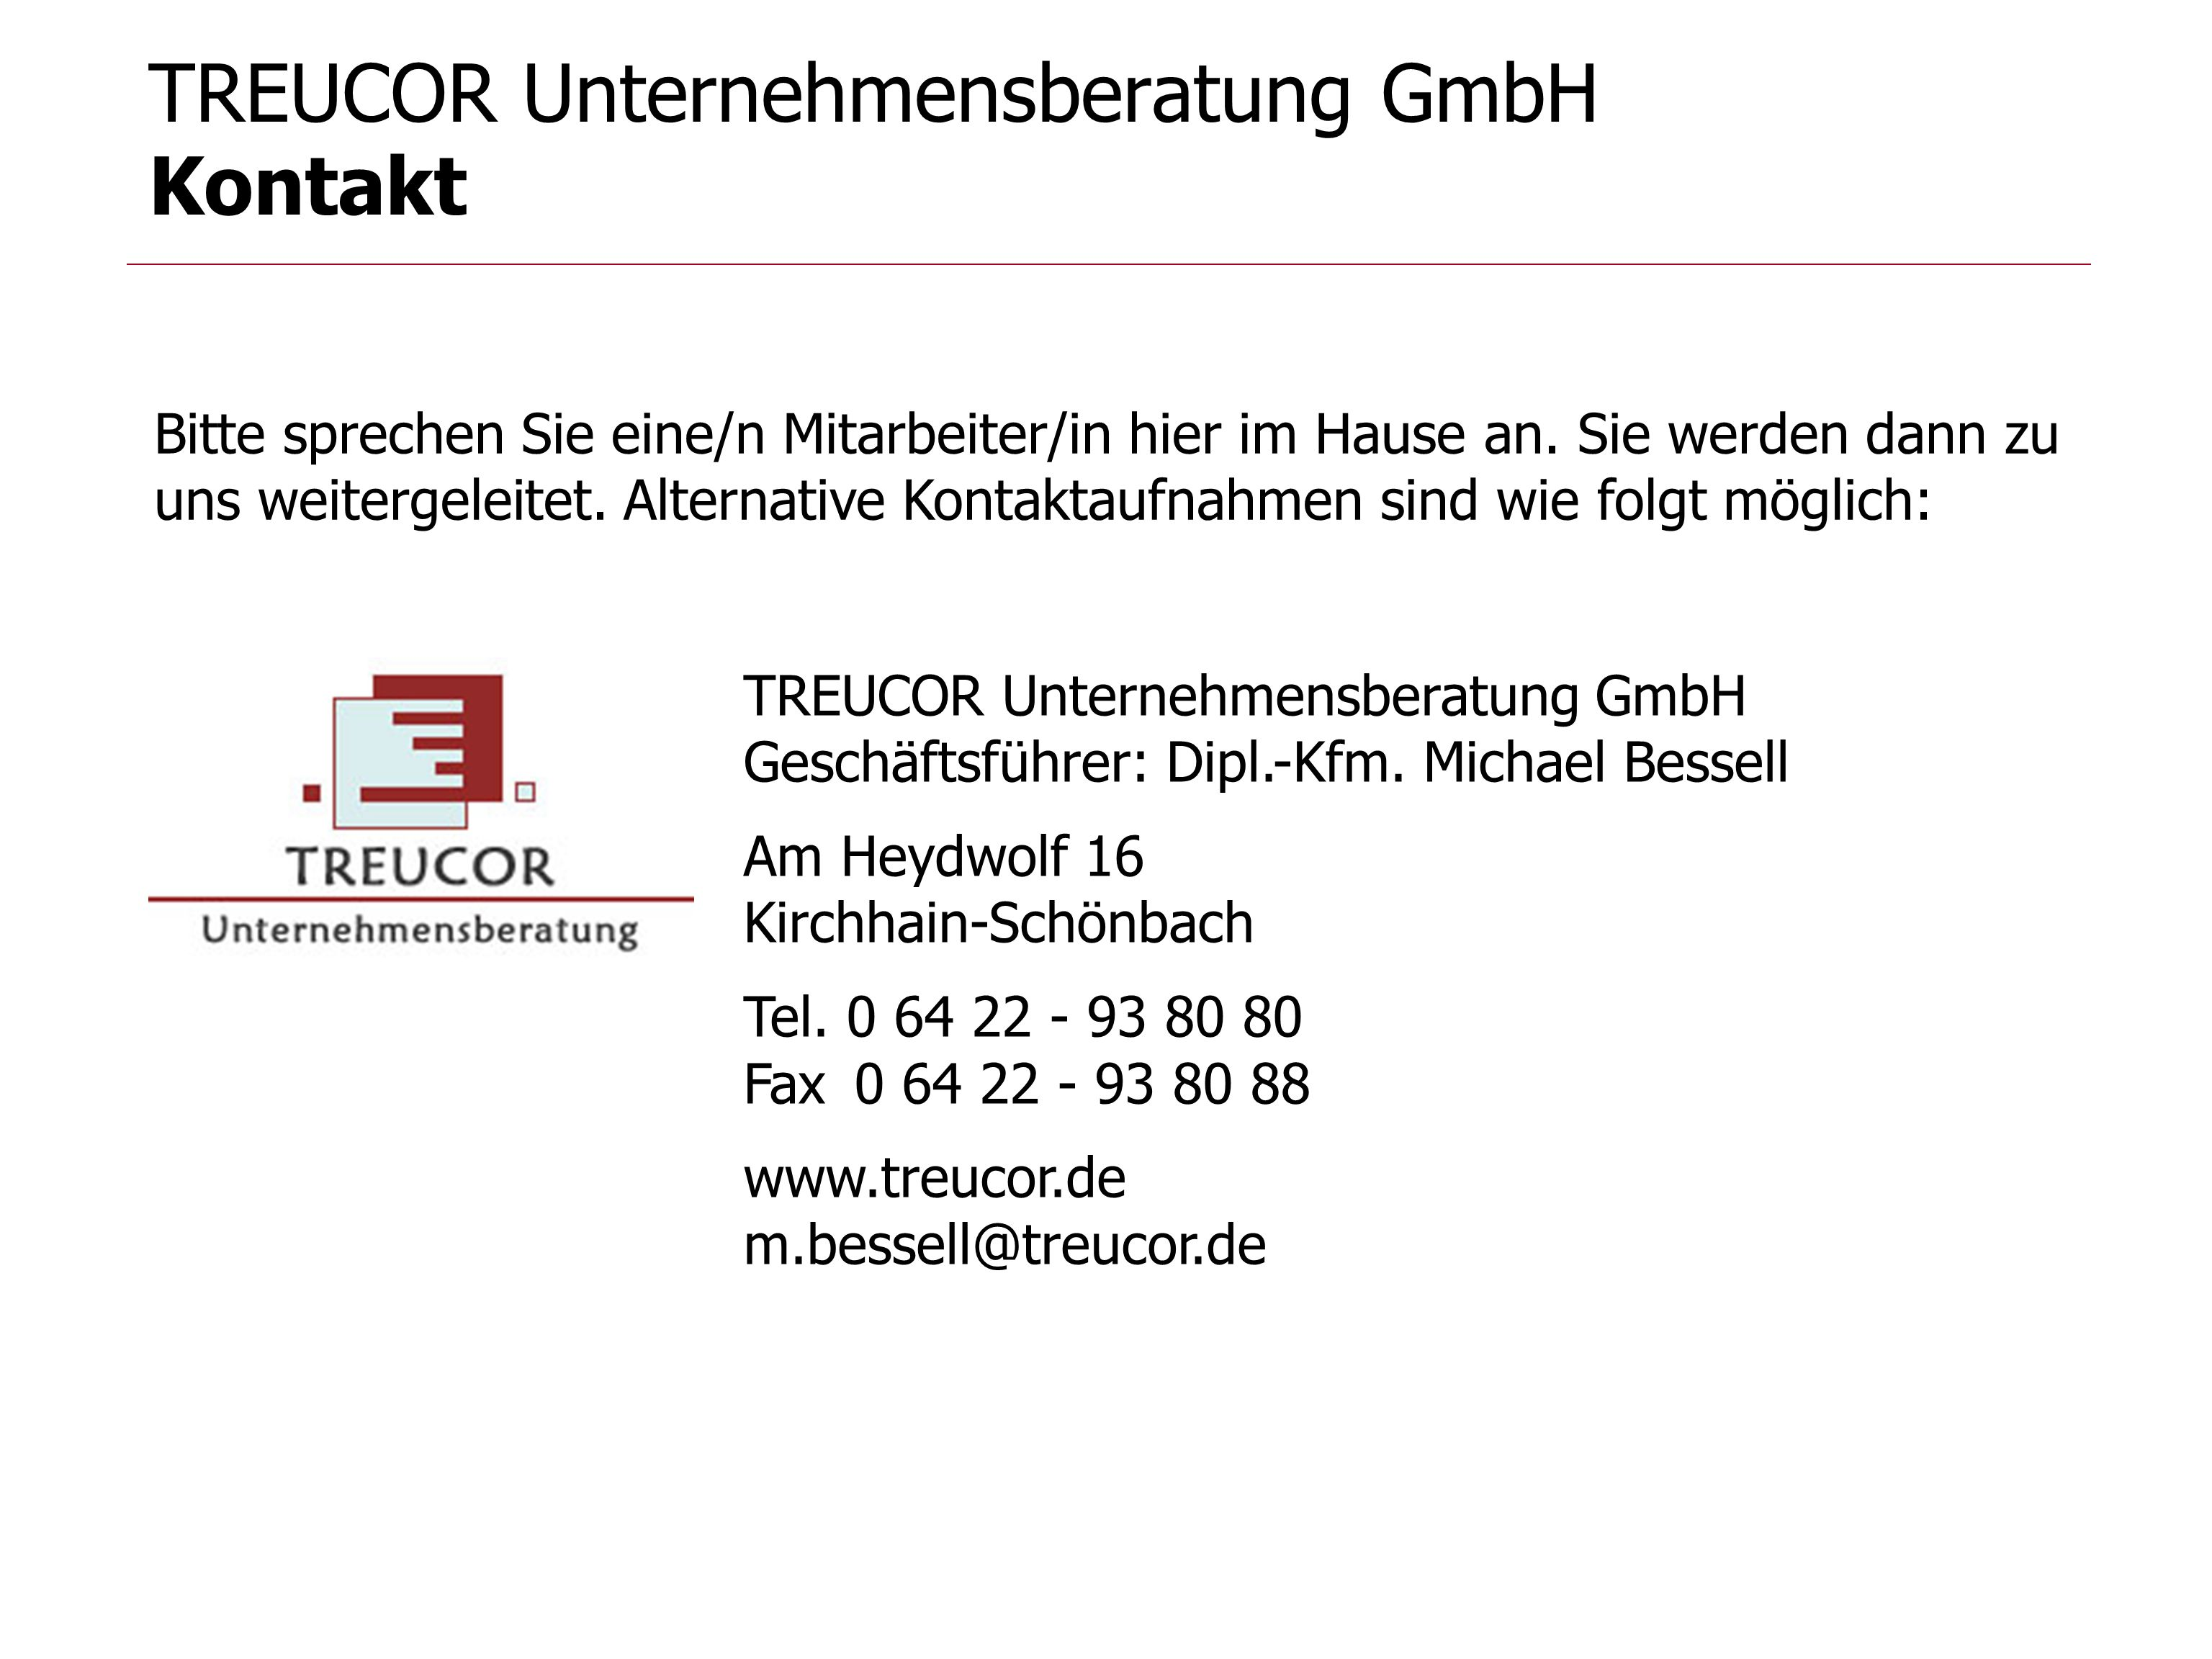 TREUCOR Unternehmensberatung GmbH Kontakt